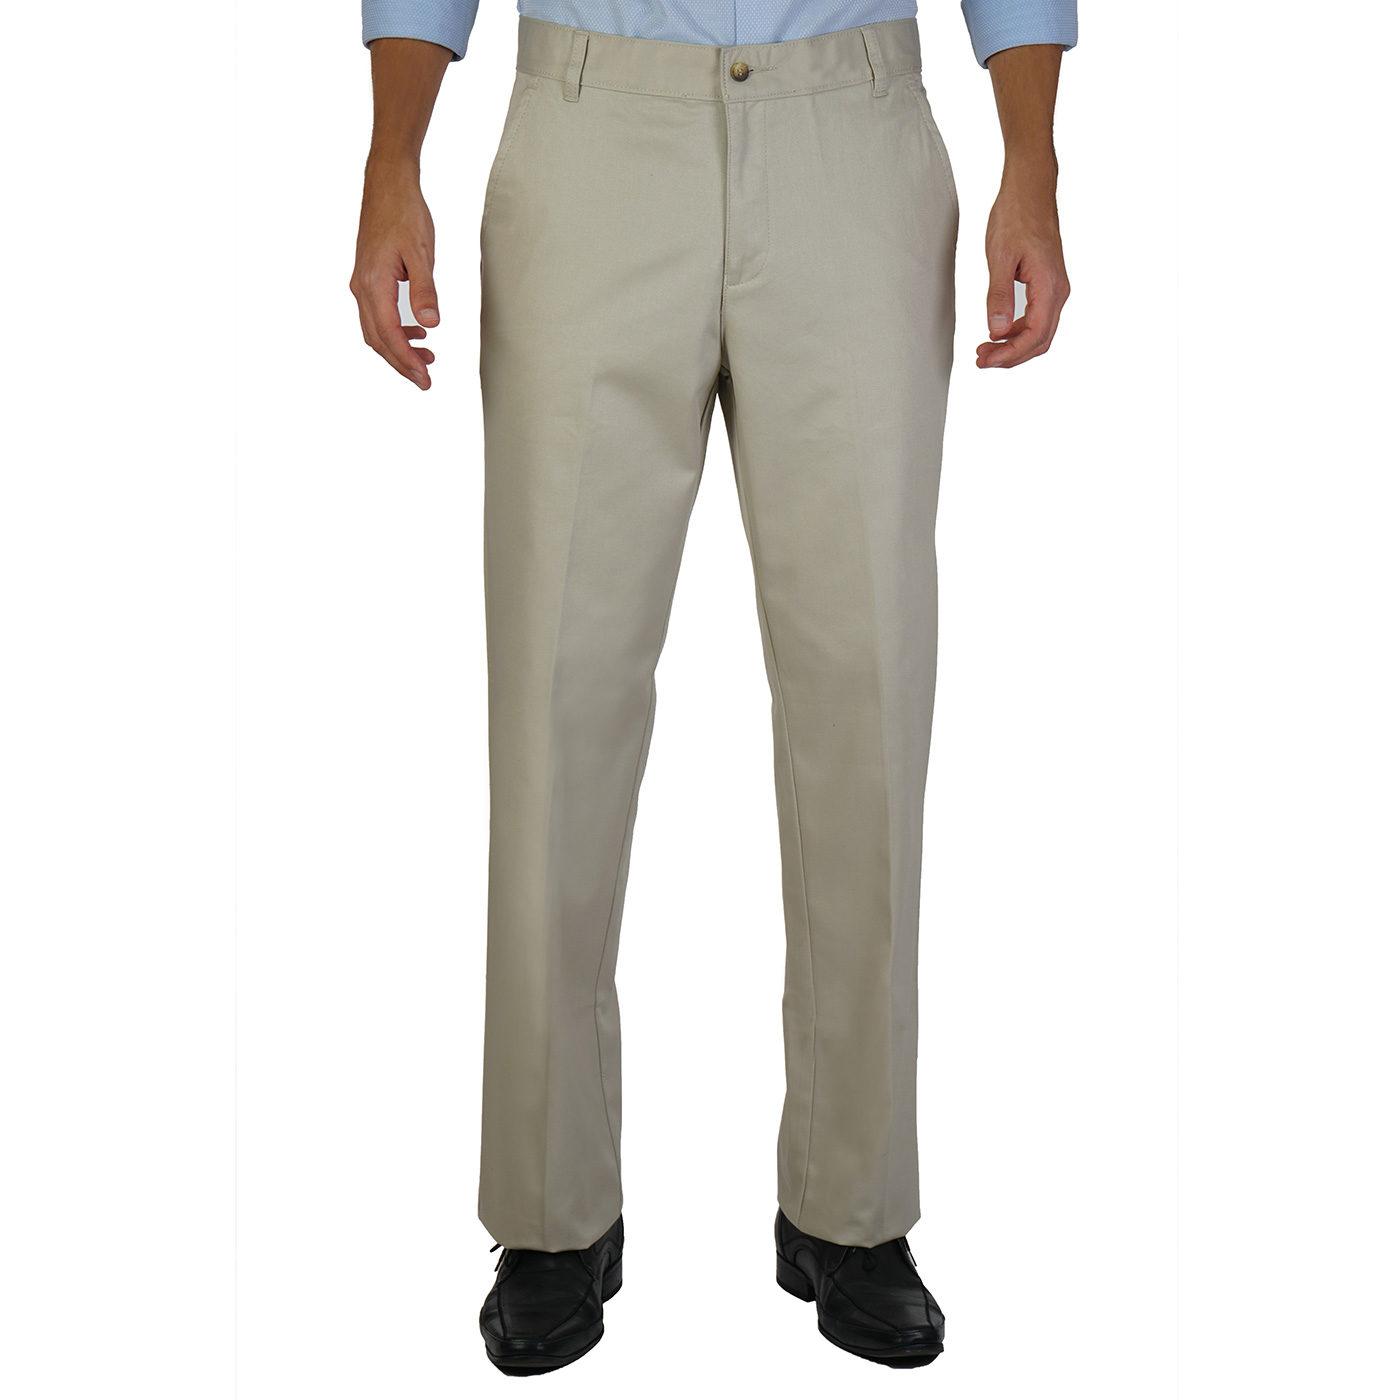 talla 40 a6154 4c4d2 Pantalón Clasico Hombre   Uniformes Ejecutivos para Hombre ...